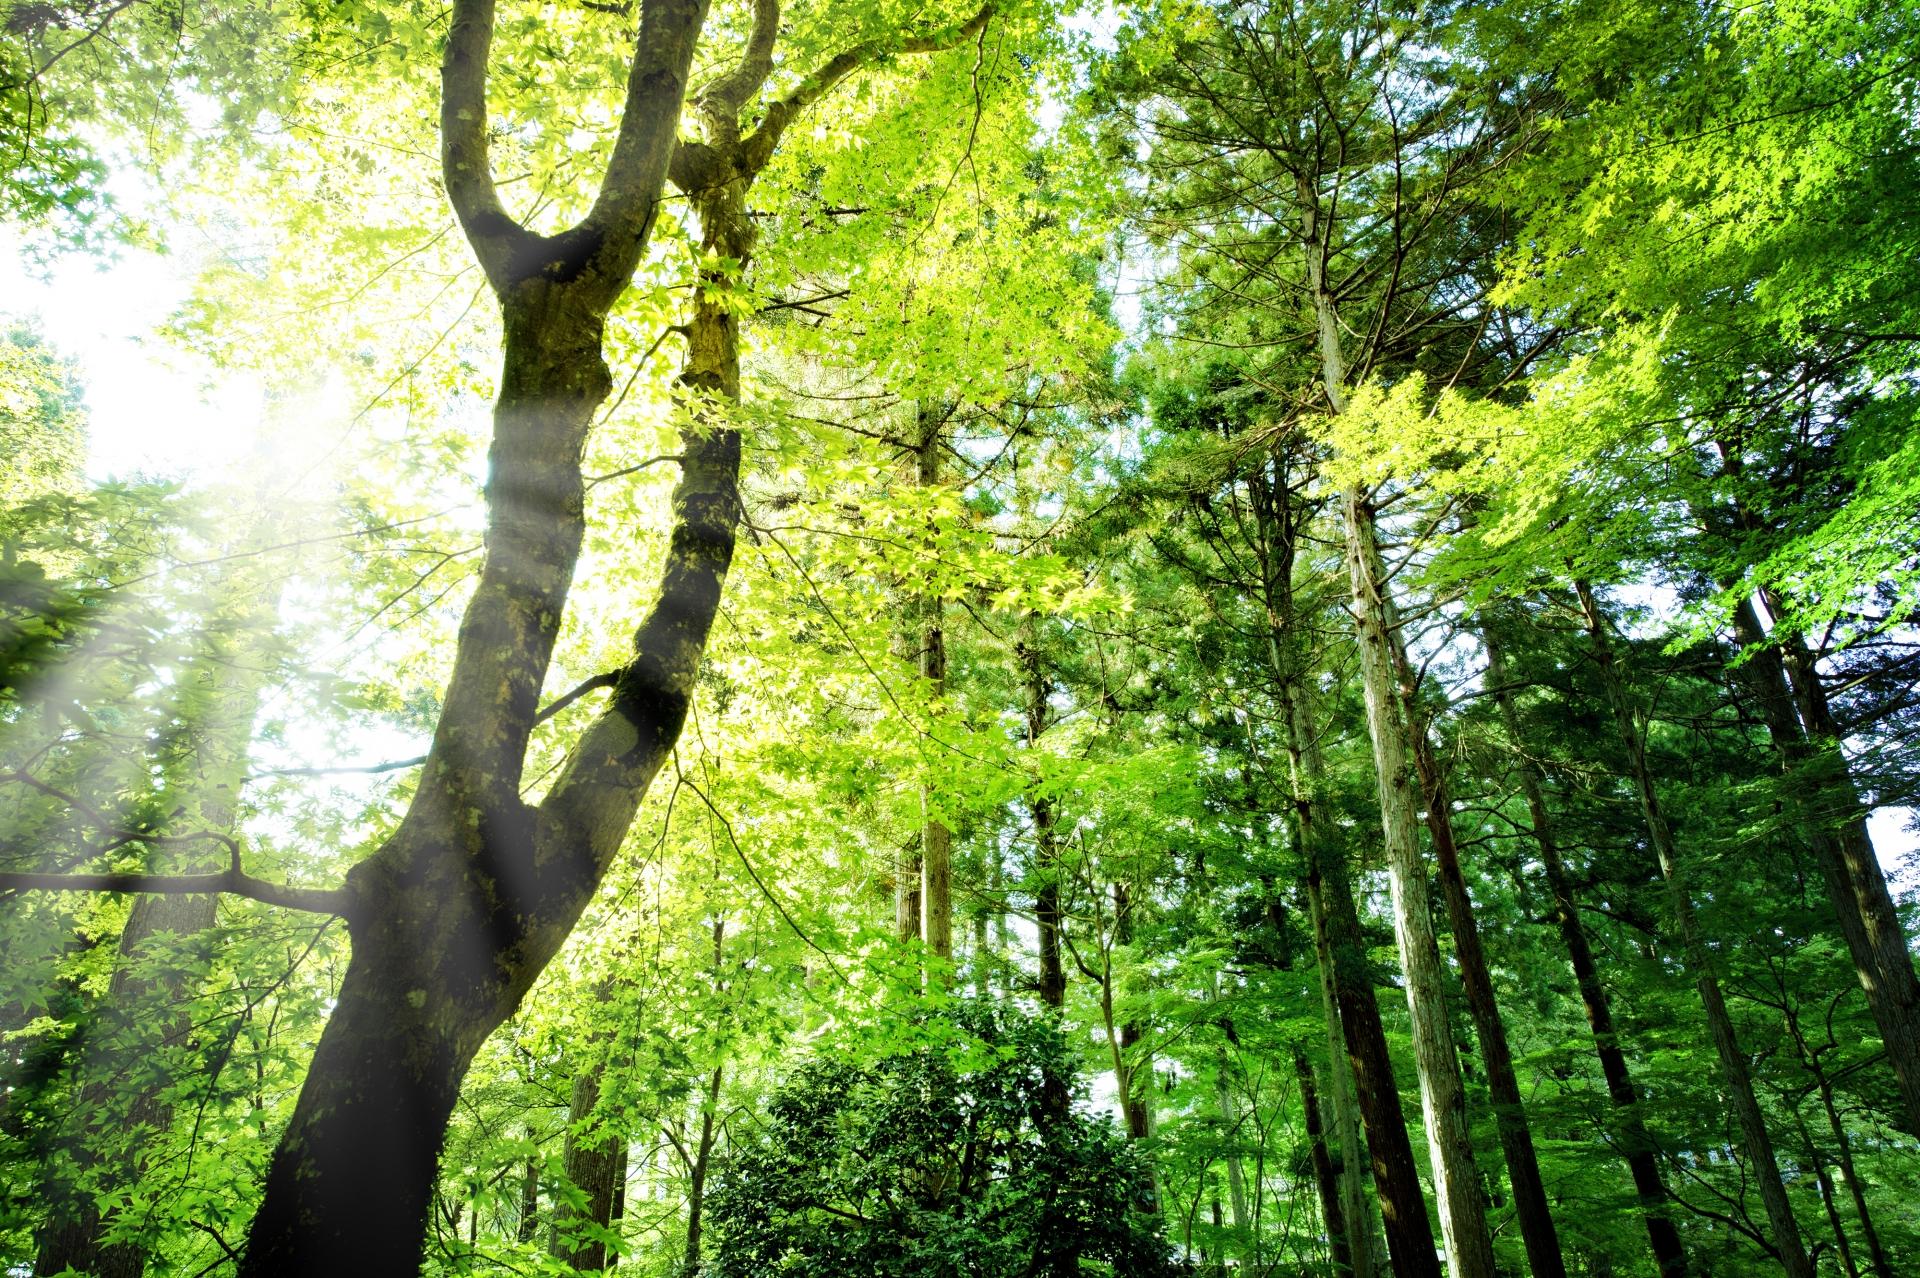 9d1f8433af176f9fcb6bf6093e349f70 m 毛髪の「森」を育てるには、「大地」となる頭皮を育てましょう